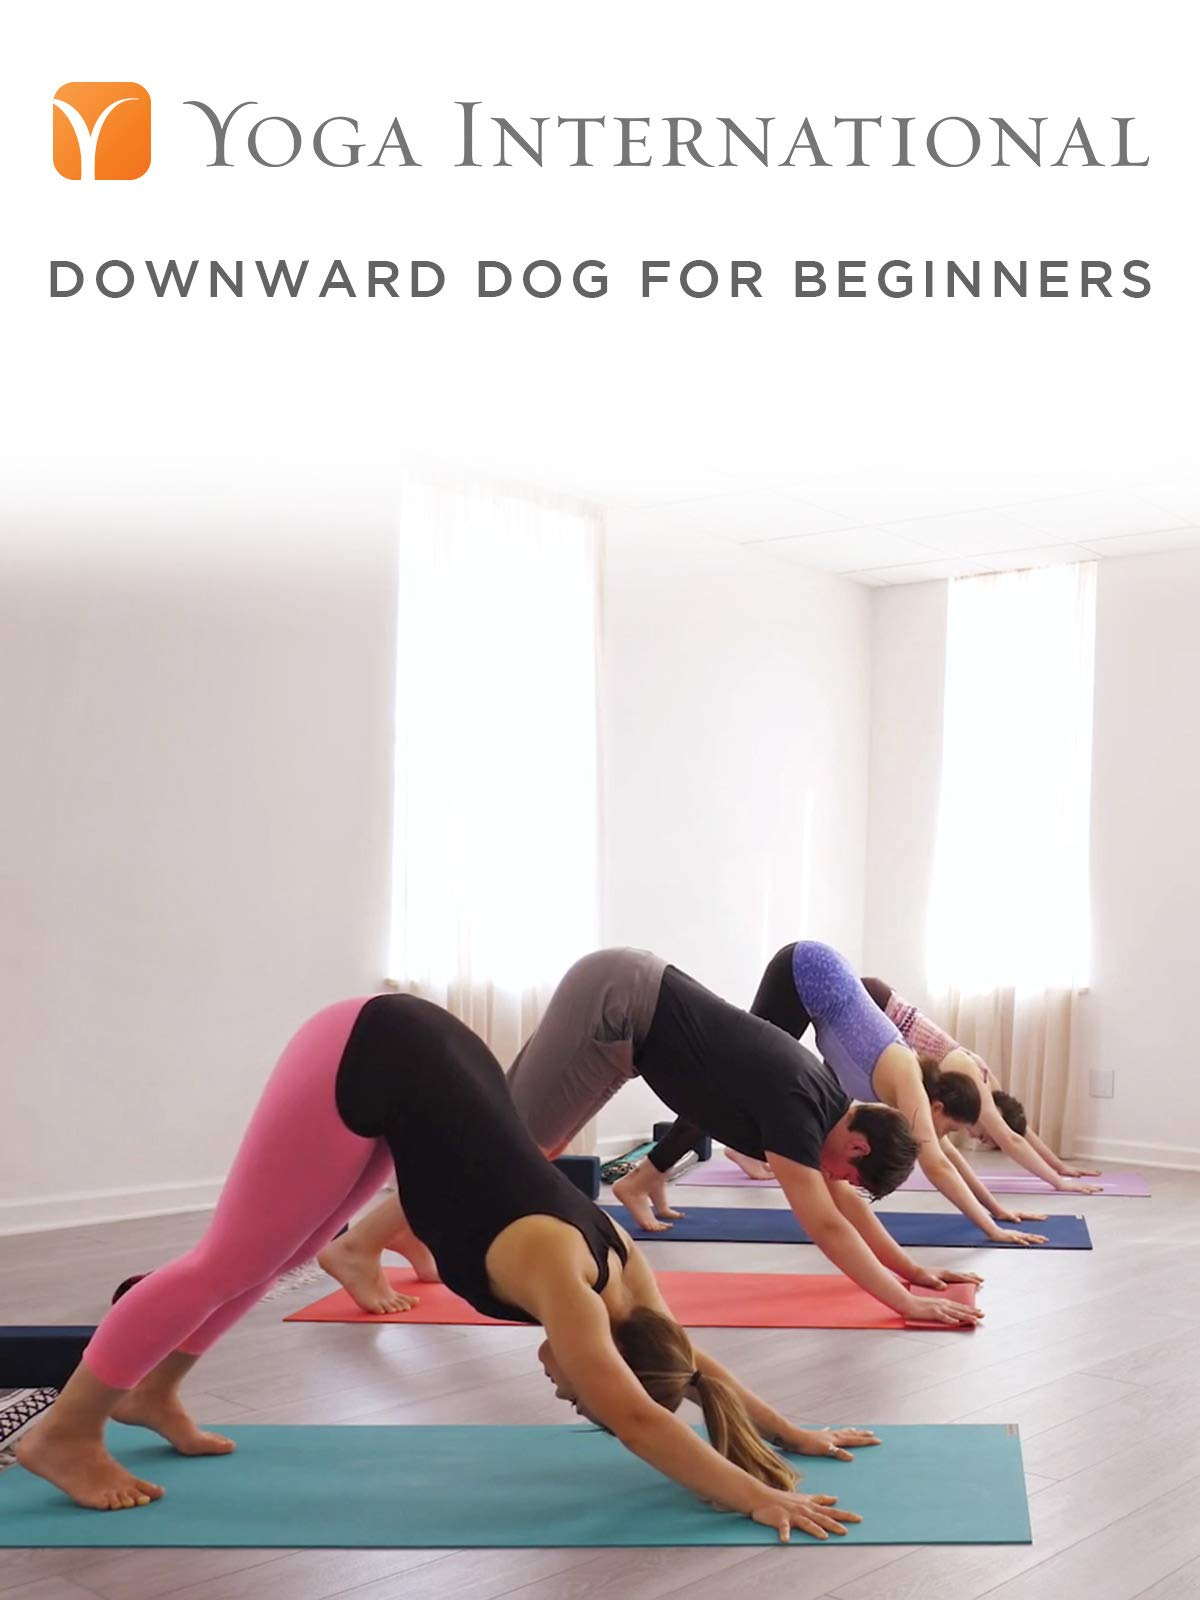 Downward Dog for Beginners